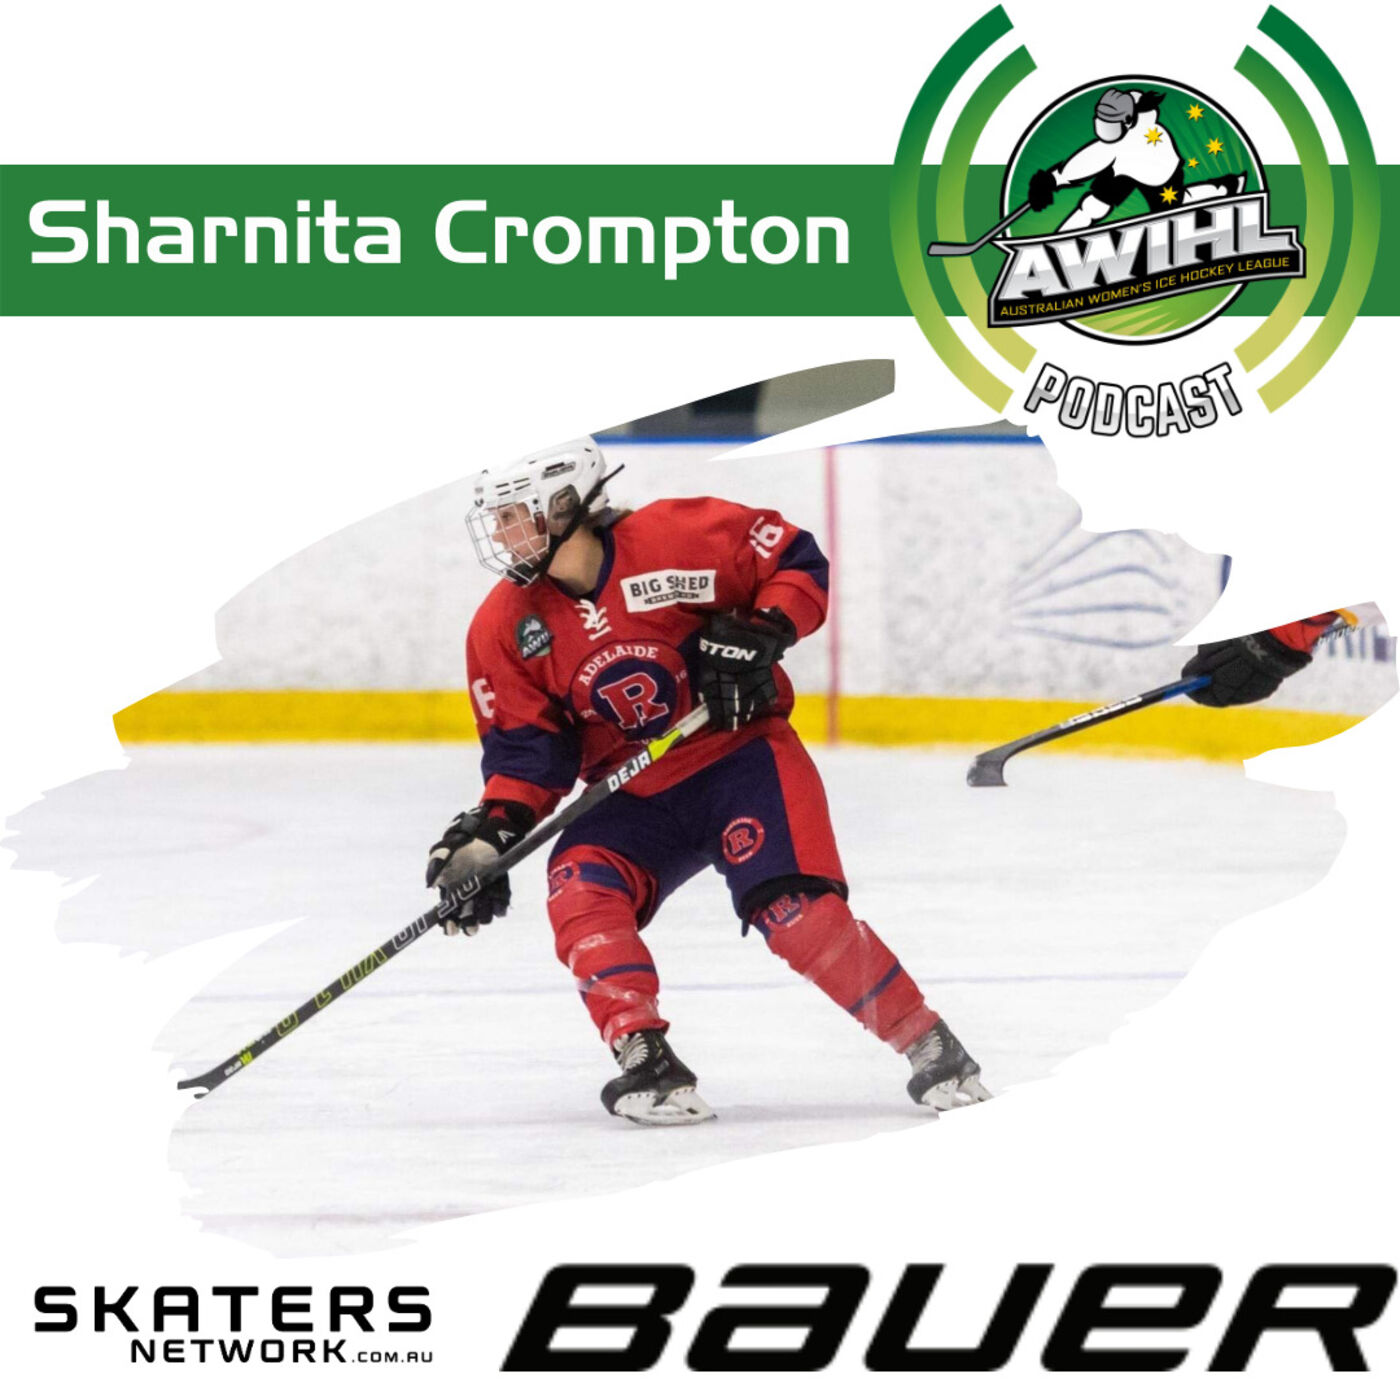 Episode Six - Sharnita Crompton